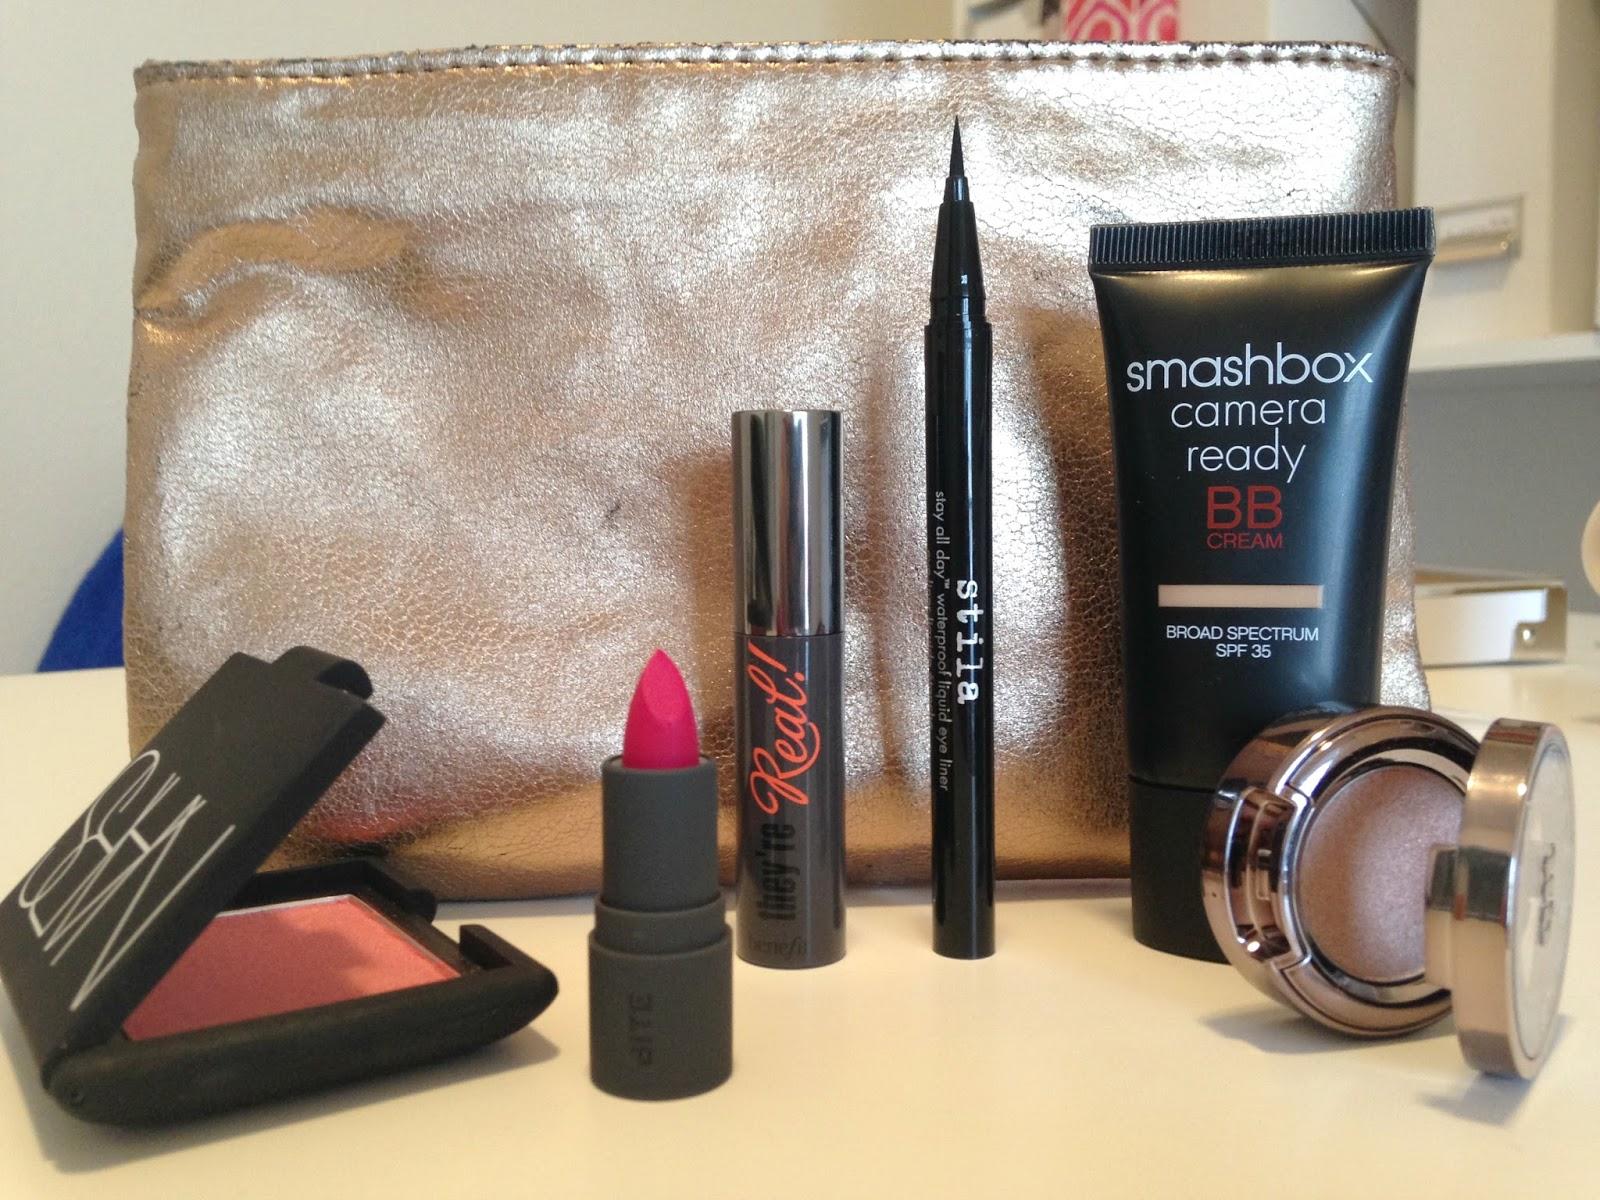 NARS orgasm blush review They're Real mascara Stilla eyeliner Smashbox BB Cream Urban Decay eyeshadow